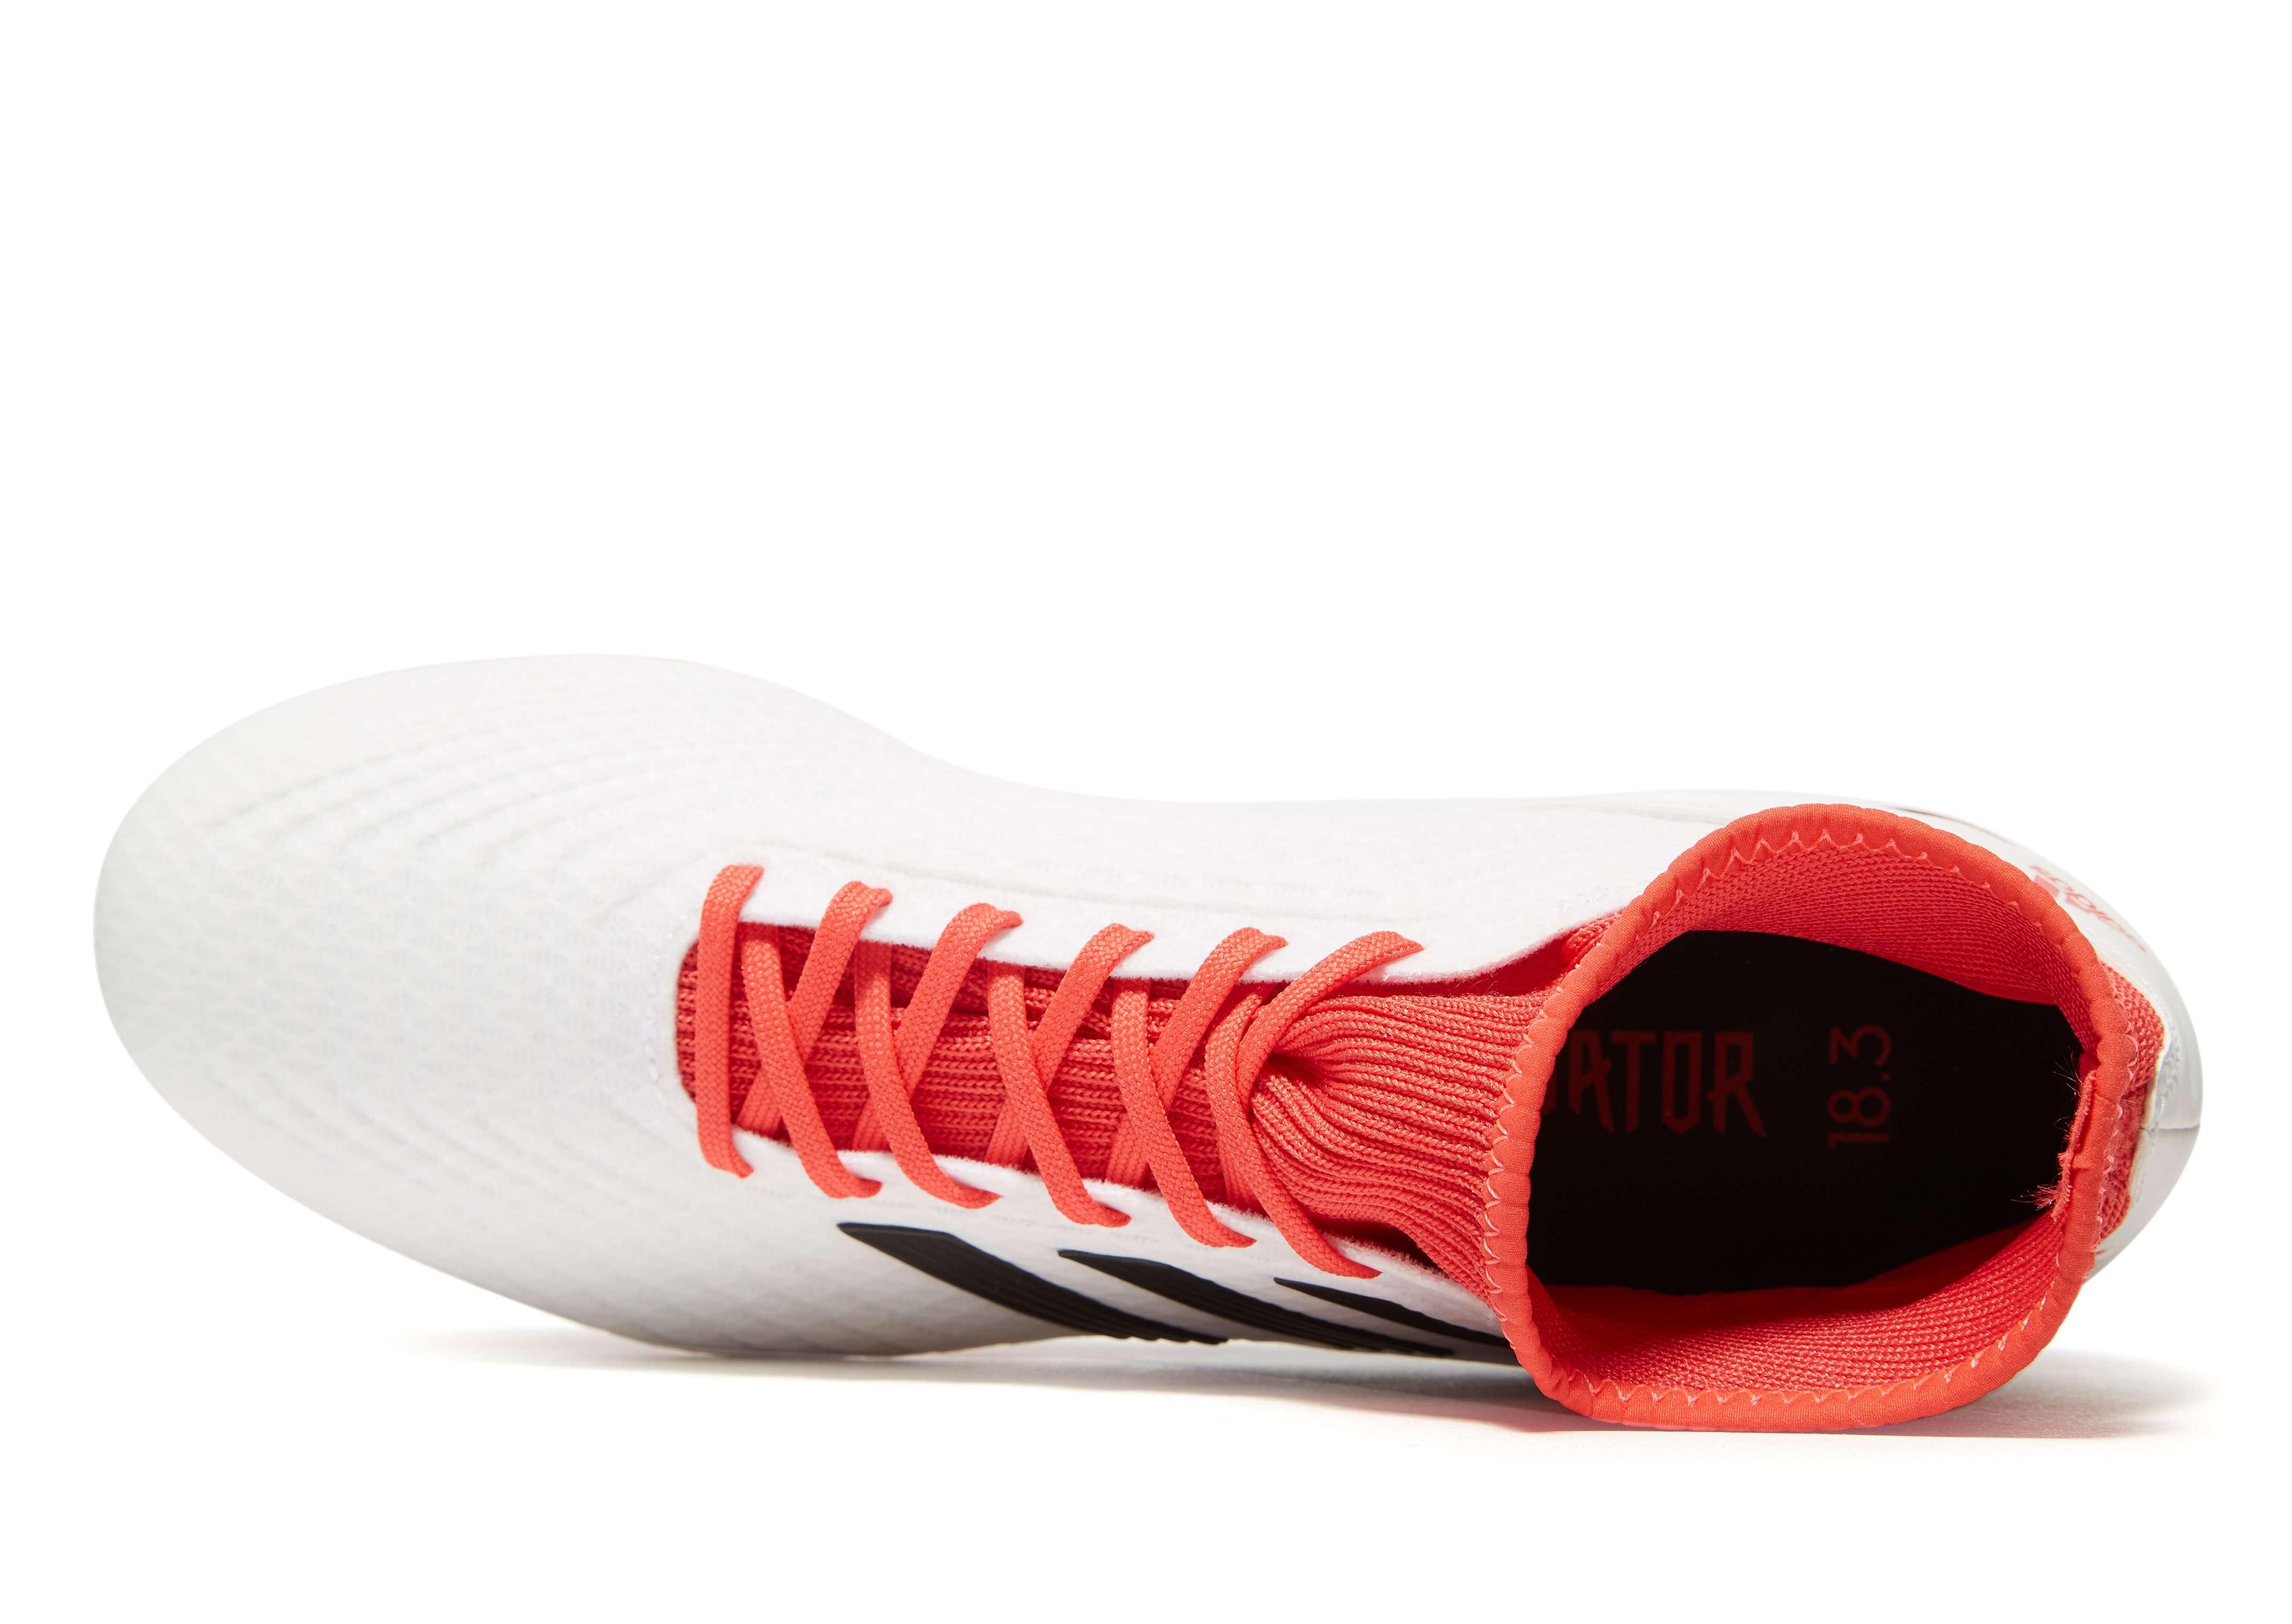 adidas Cold Blooded Predator 18.3 FG